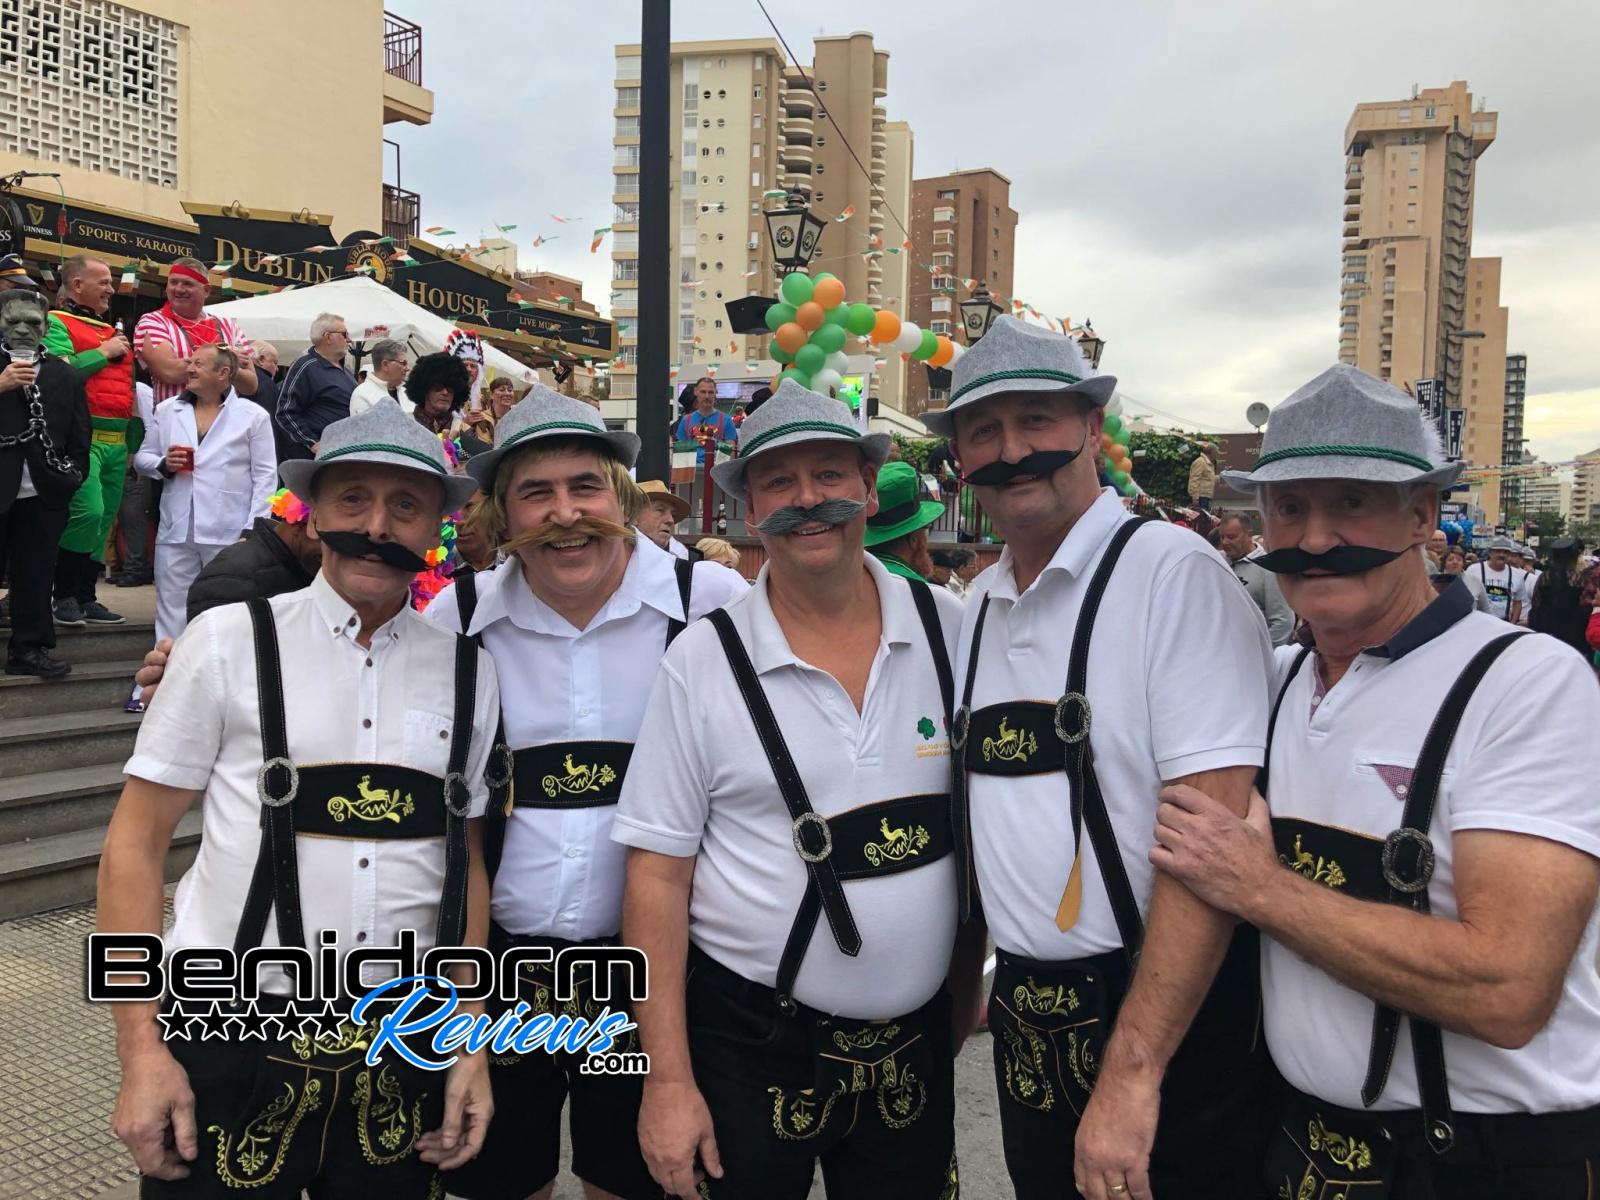 Benidorm-Fiestas-2019-Fancy-Dress-107